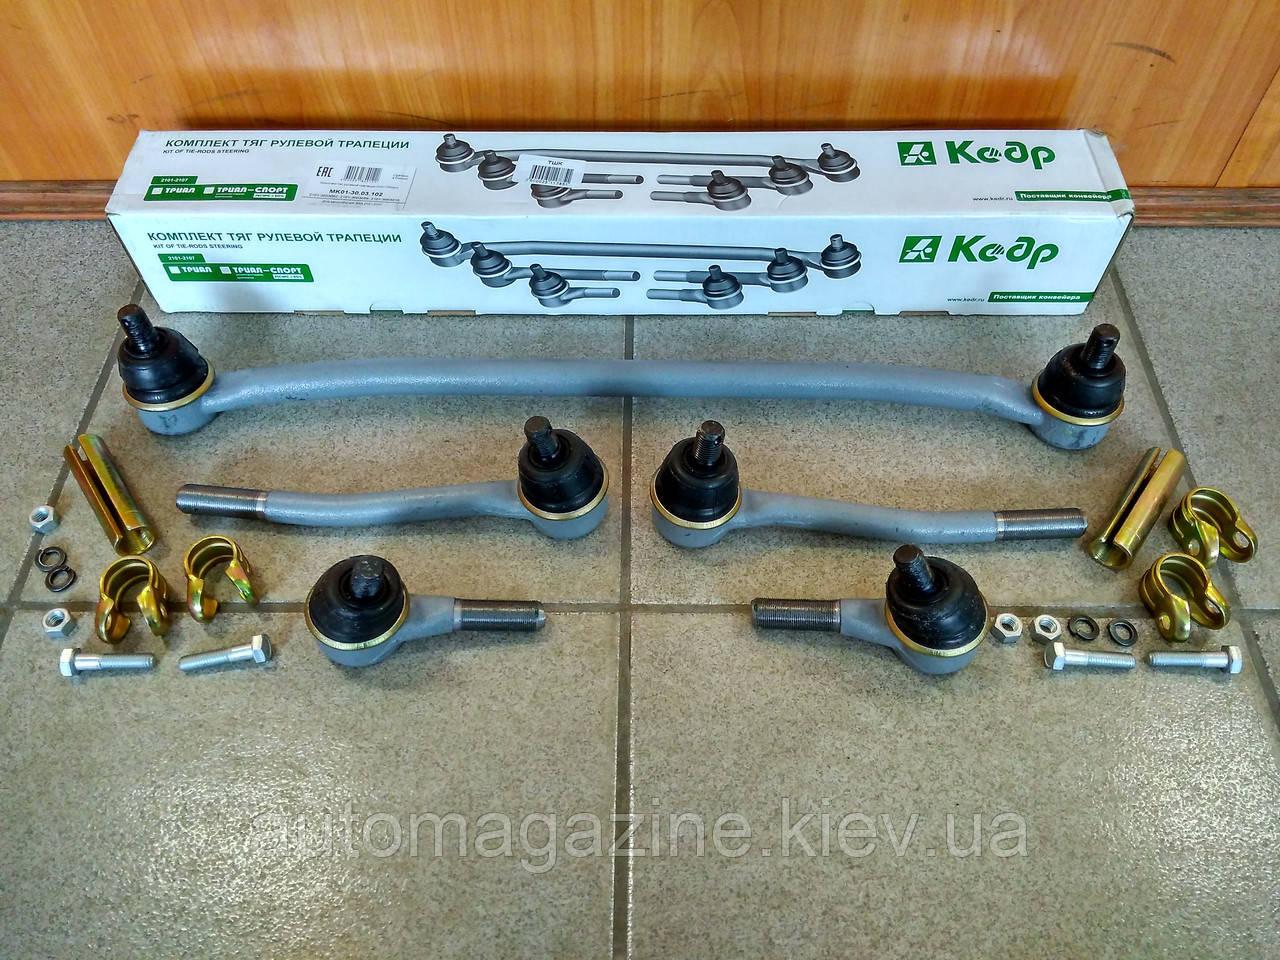 Рульова трапеція ВАЗ 2101 - 2107 (комплект)